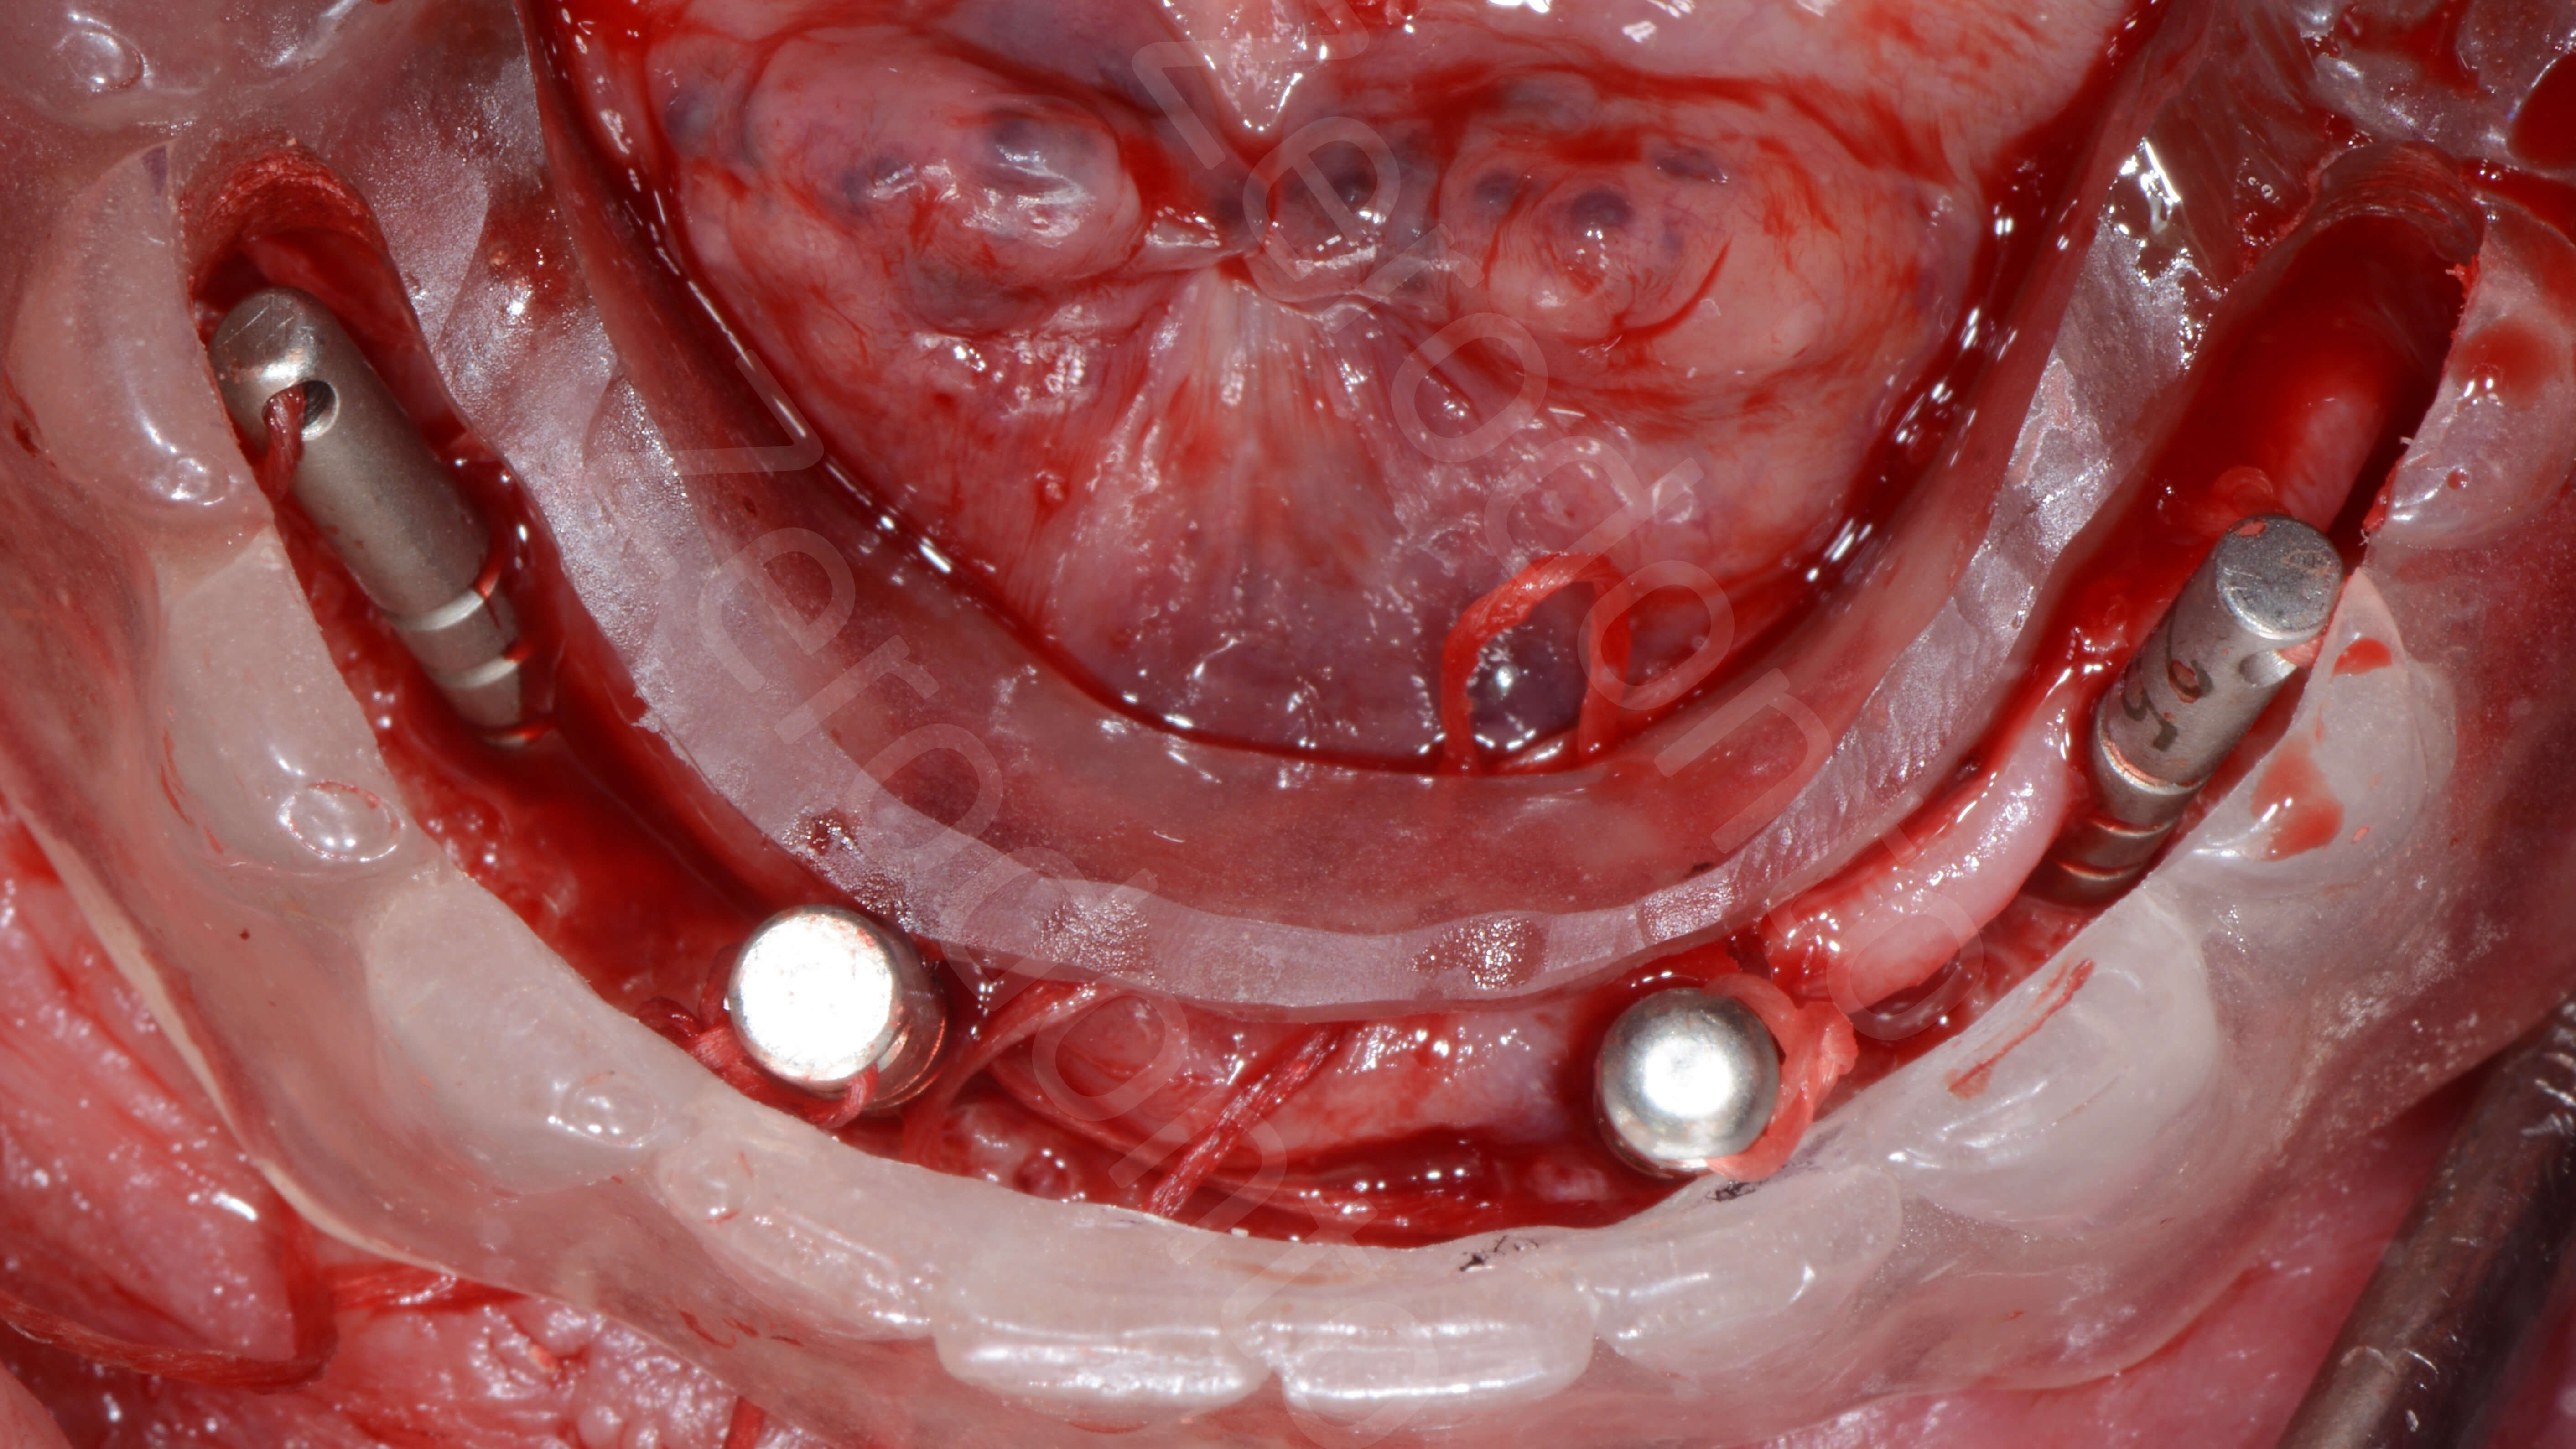 Dr Kan Wongkamhaeng Full Mouth Rehabilitation Of An Edentulous Jaw Wiring Surgery 4 Mandibular